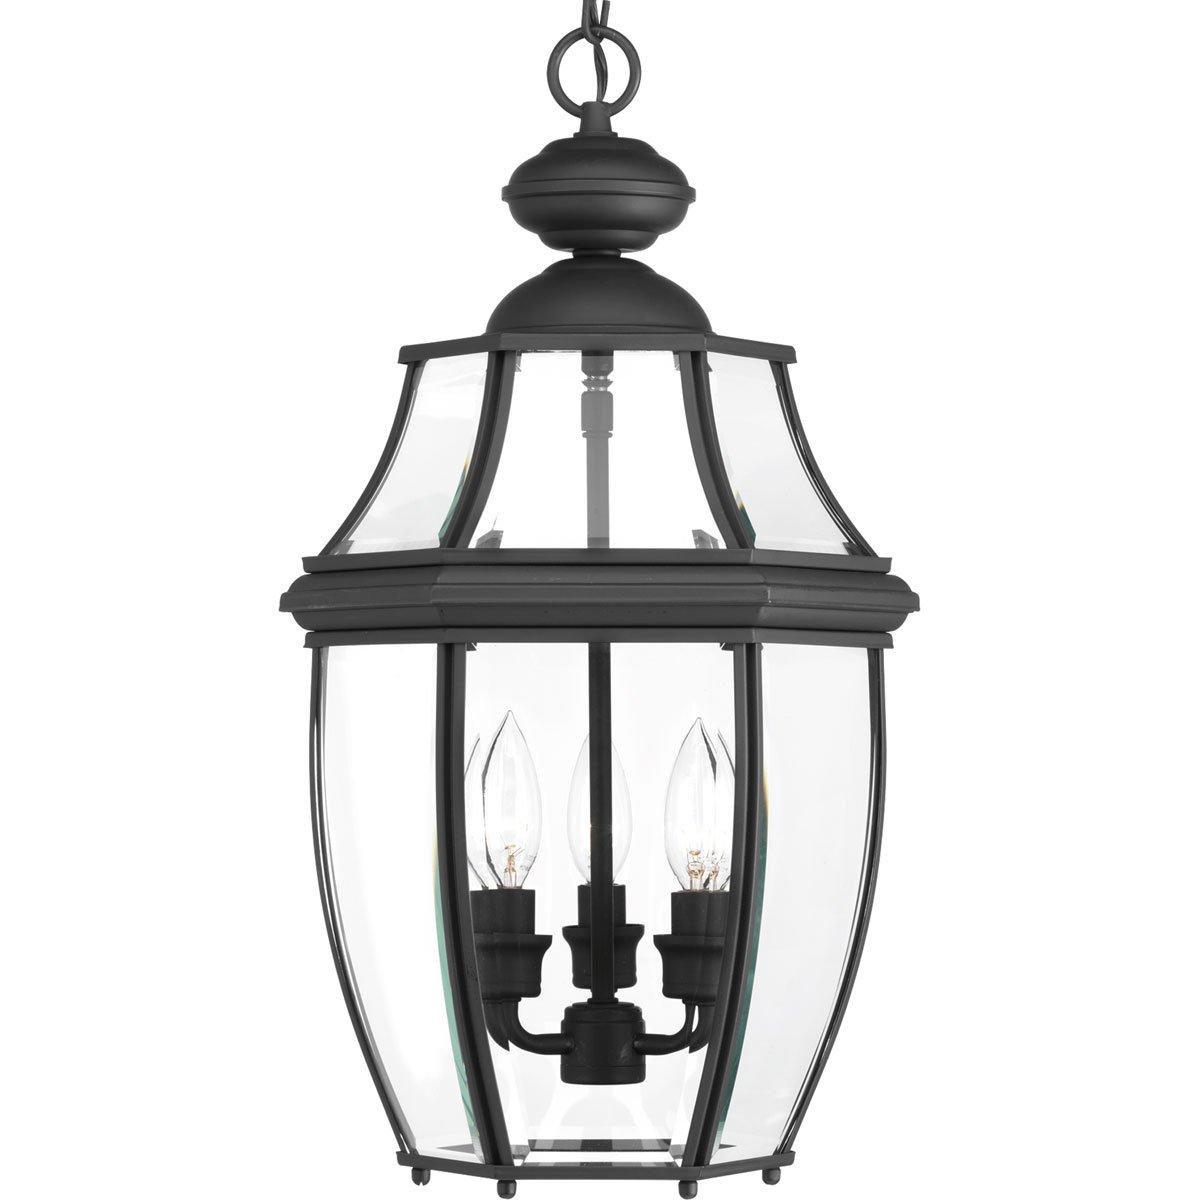 Progress Lighting P6533-31 New Haven Three-Light Hanging Lantern, Stainless Steel